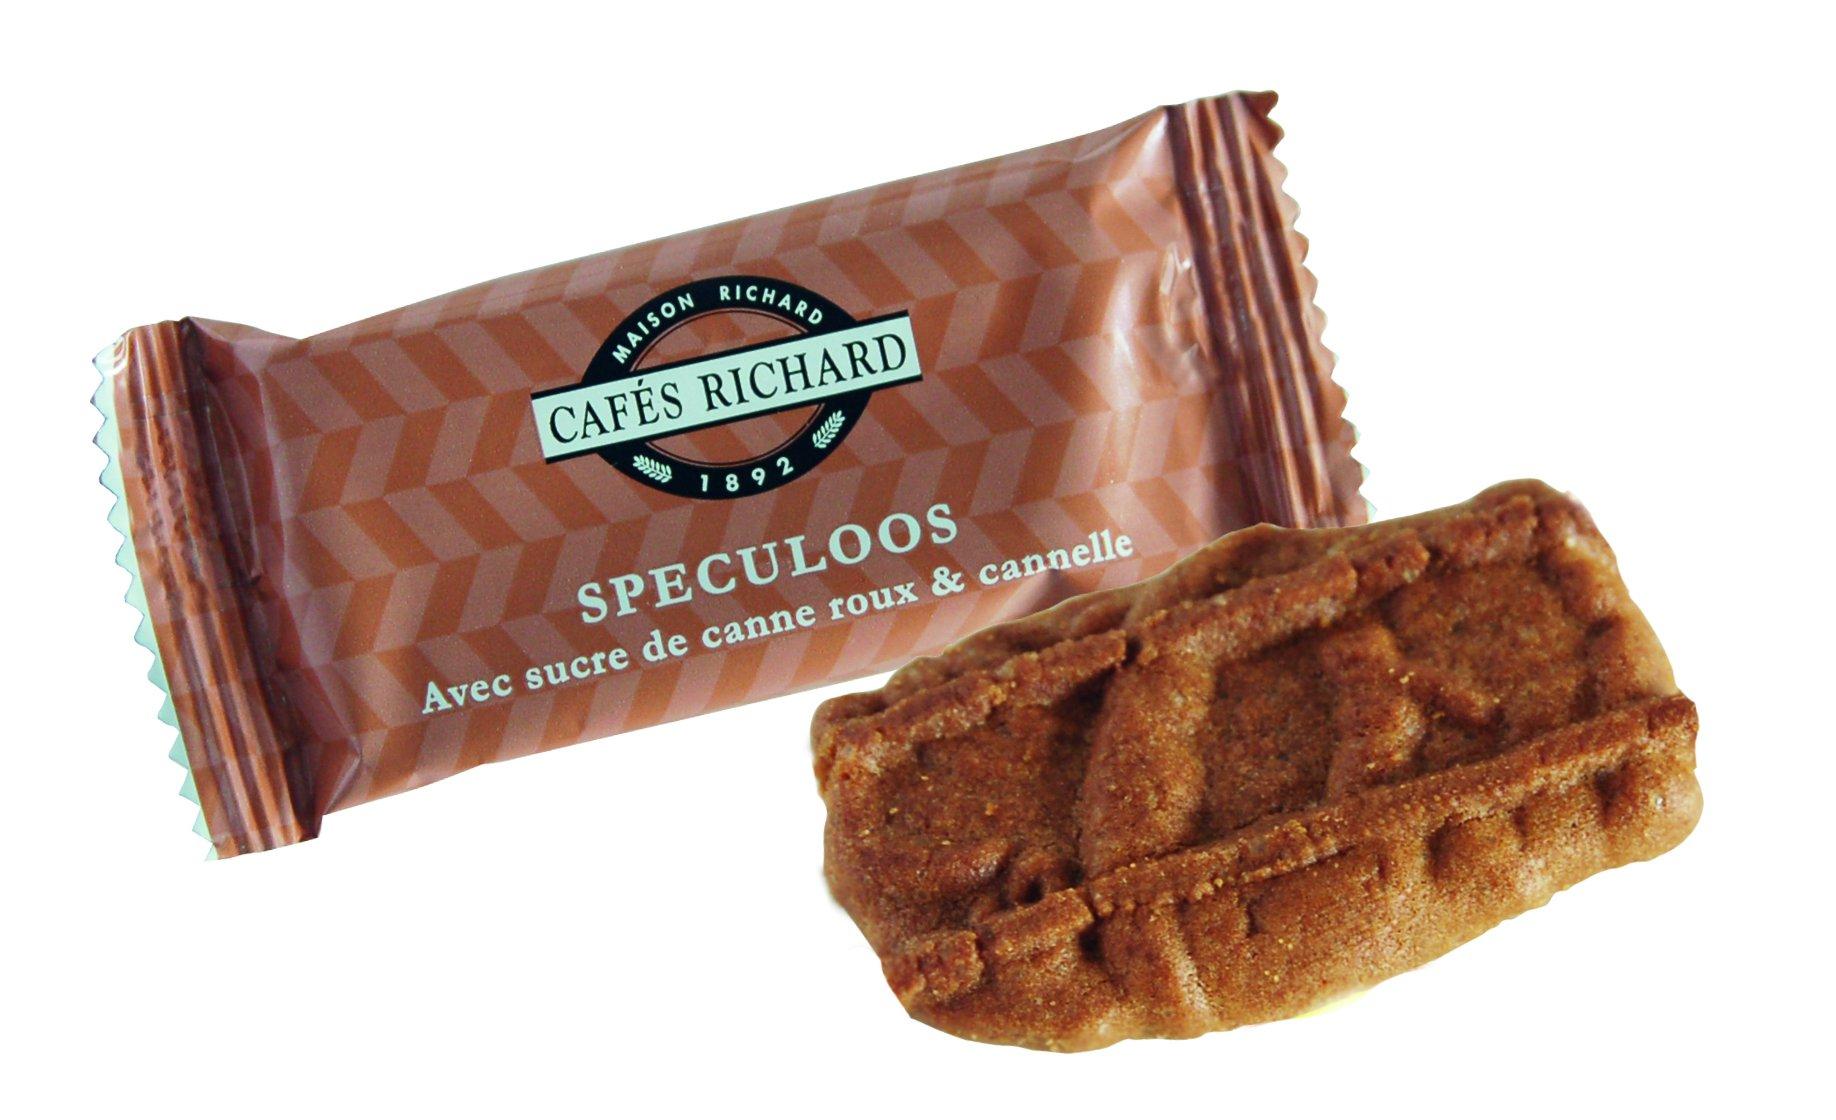 Cafés Richard Speculoos Cookies (300 count) by Cafés Richard (Image #1)